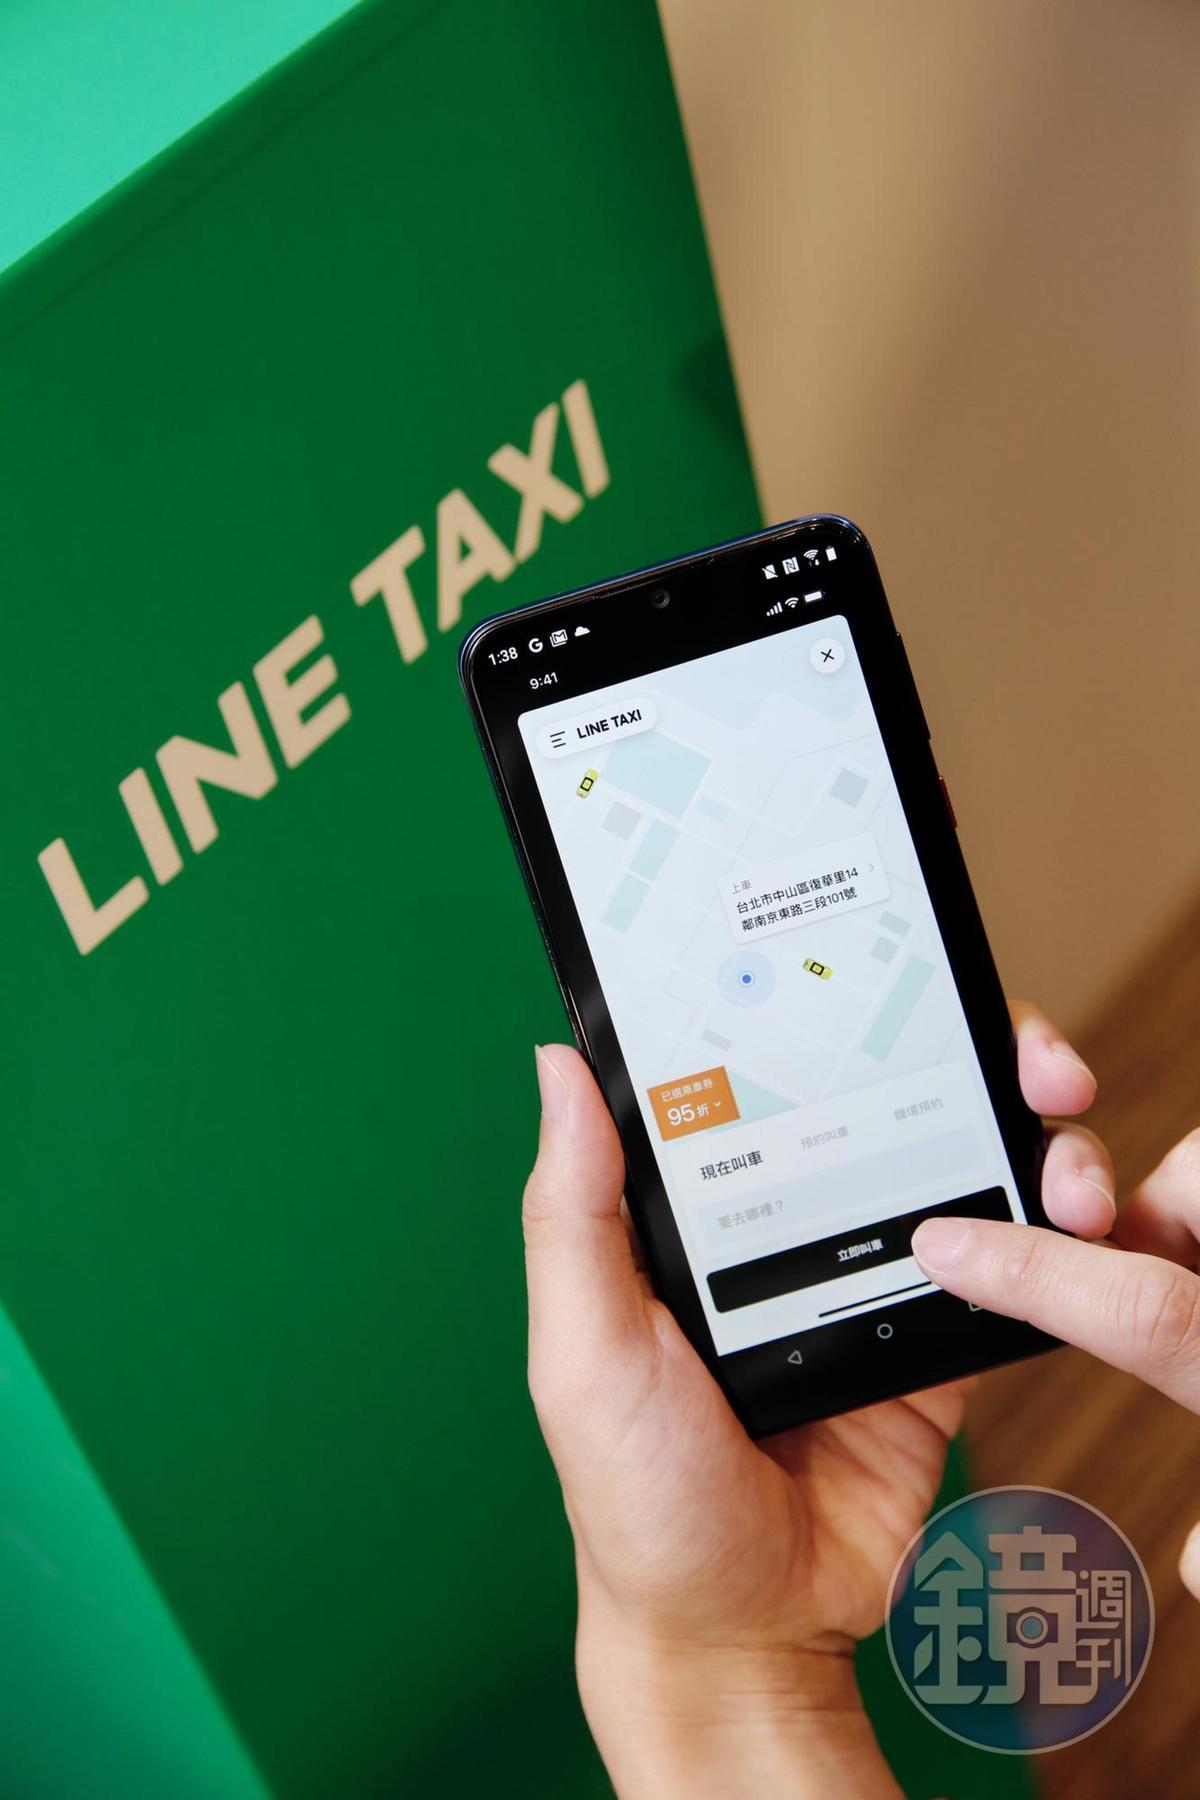 LINE TAXI上線1年,透過LINE主頁一鍵叫車,結合LINE Pay、LINE Point等多元付款,讓乘客數、乘趟數增加3倍。